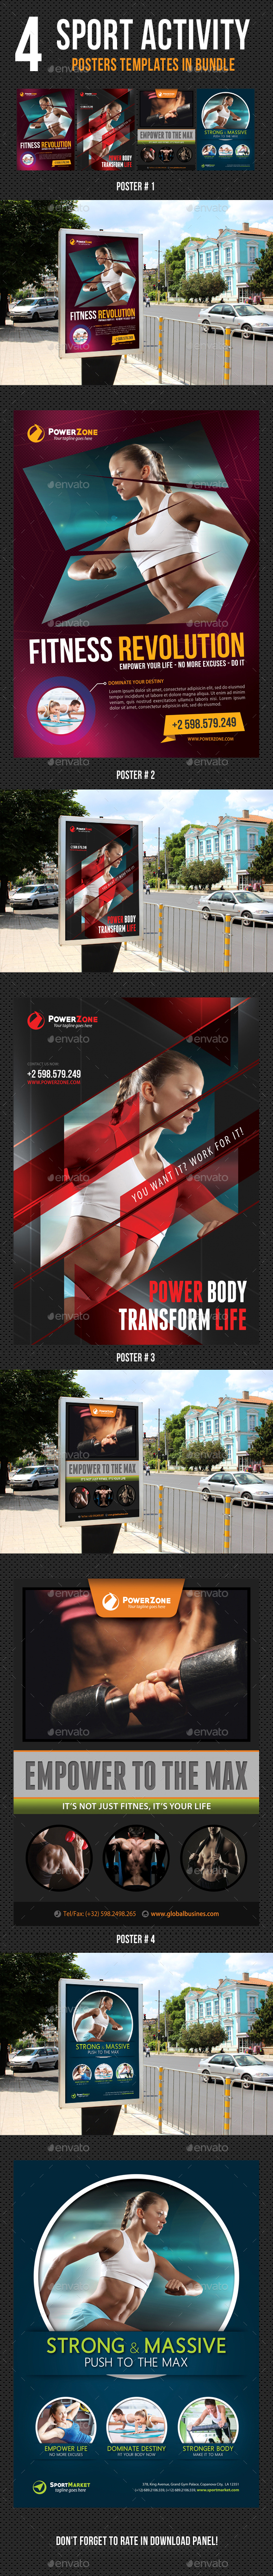 4 in 1 Sport Activity Poster Bundle V01 - Signage Print Templates